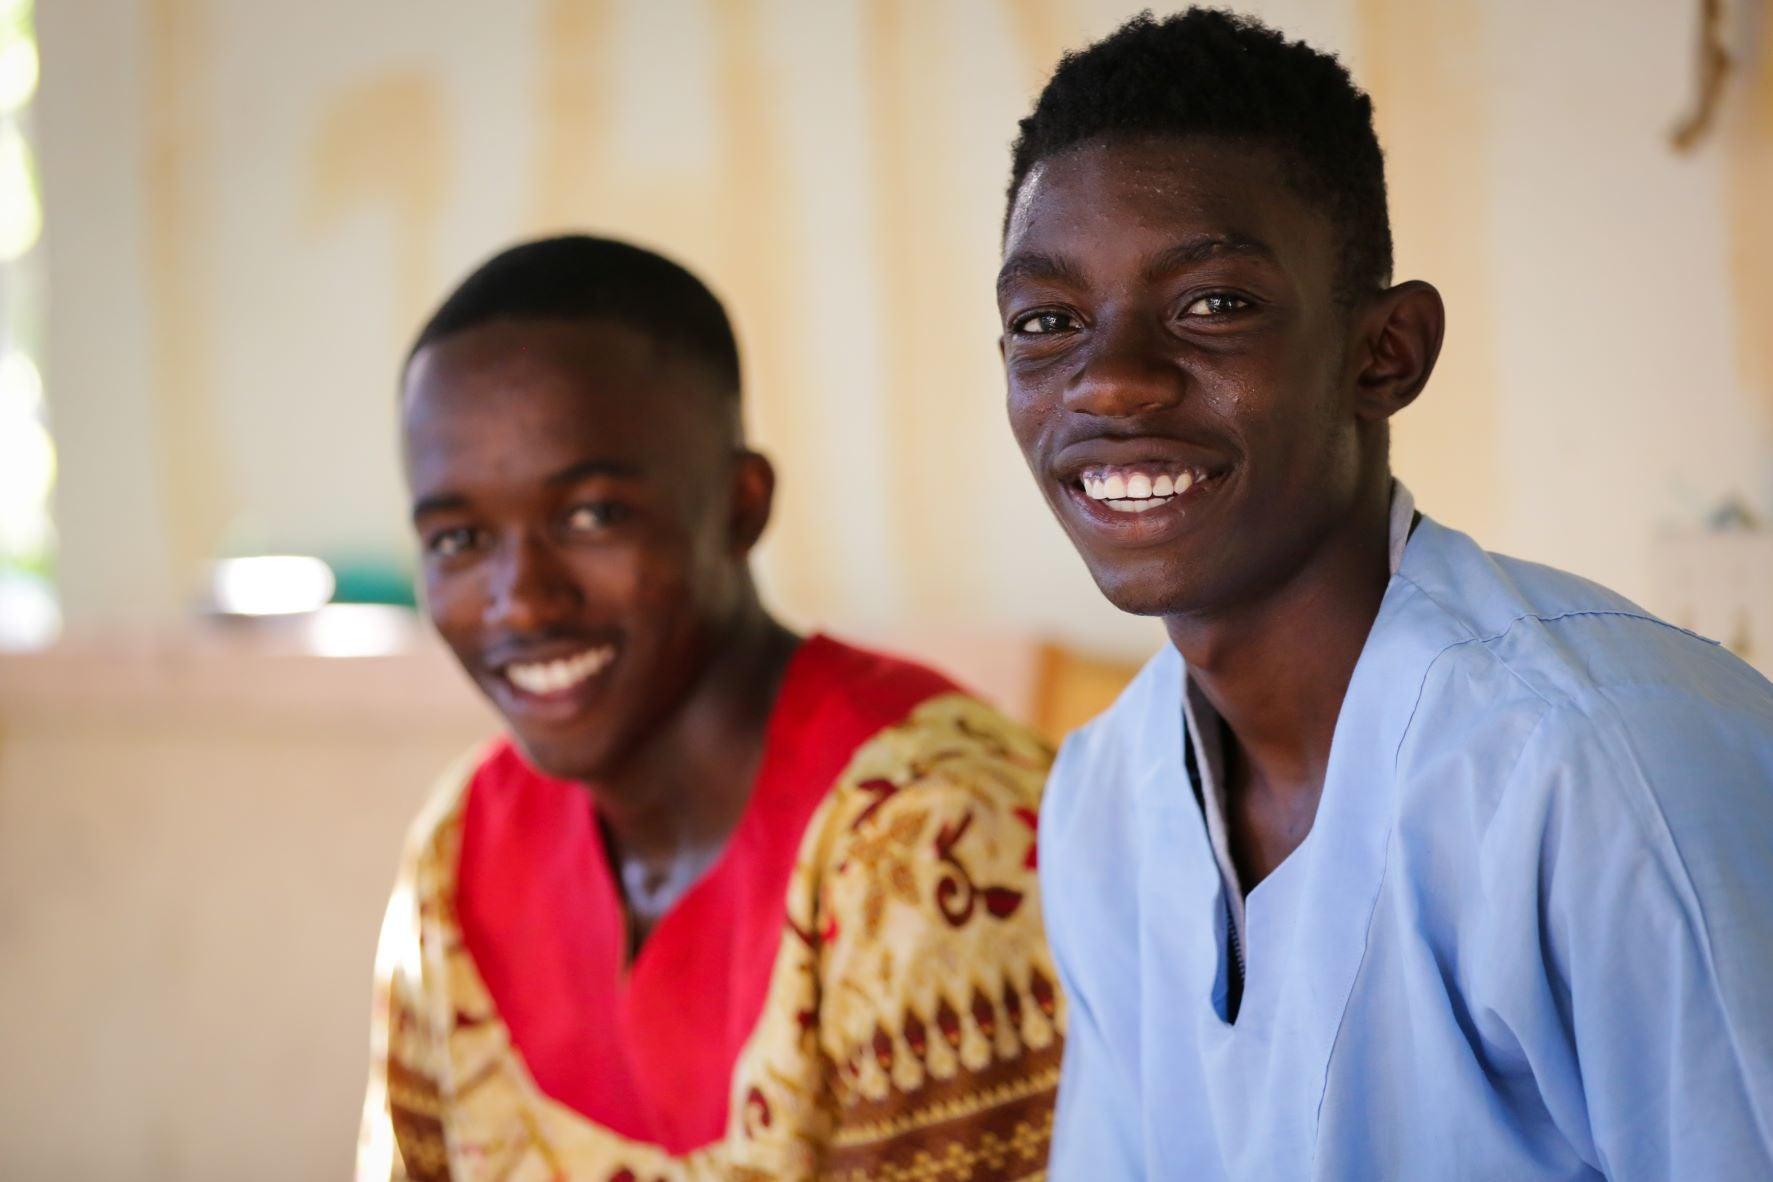 Two African Descendant men smiling